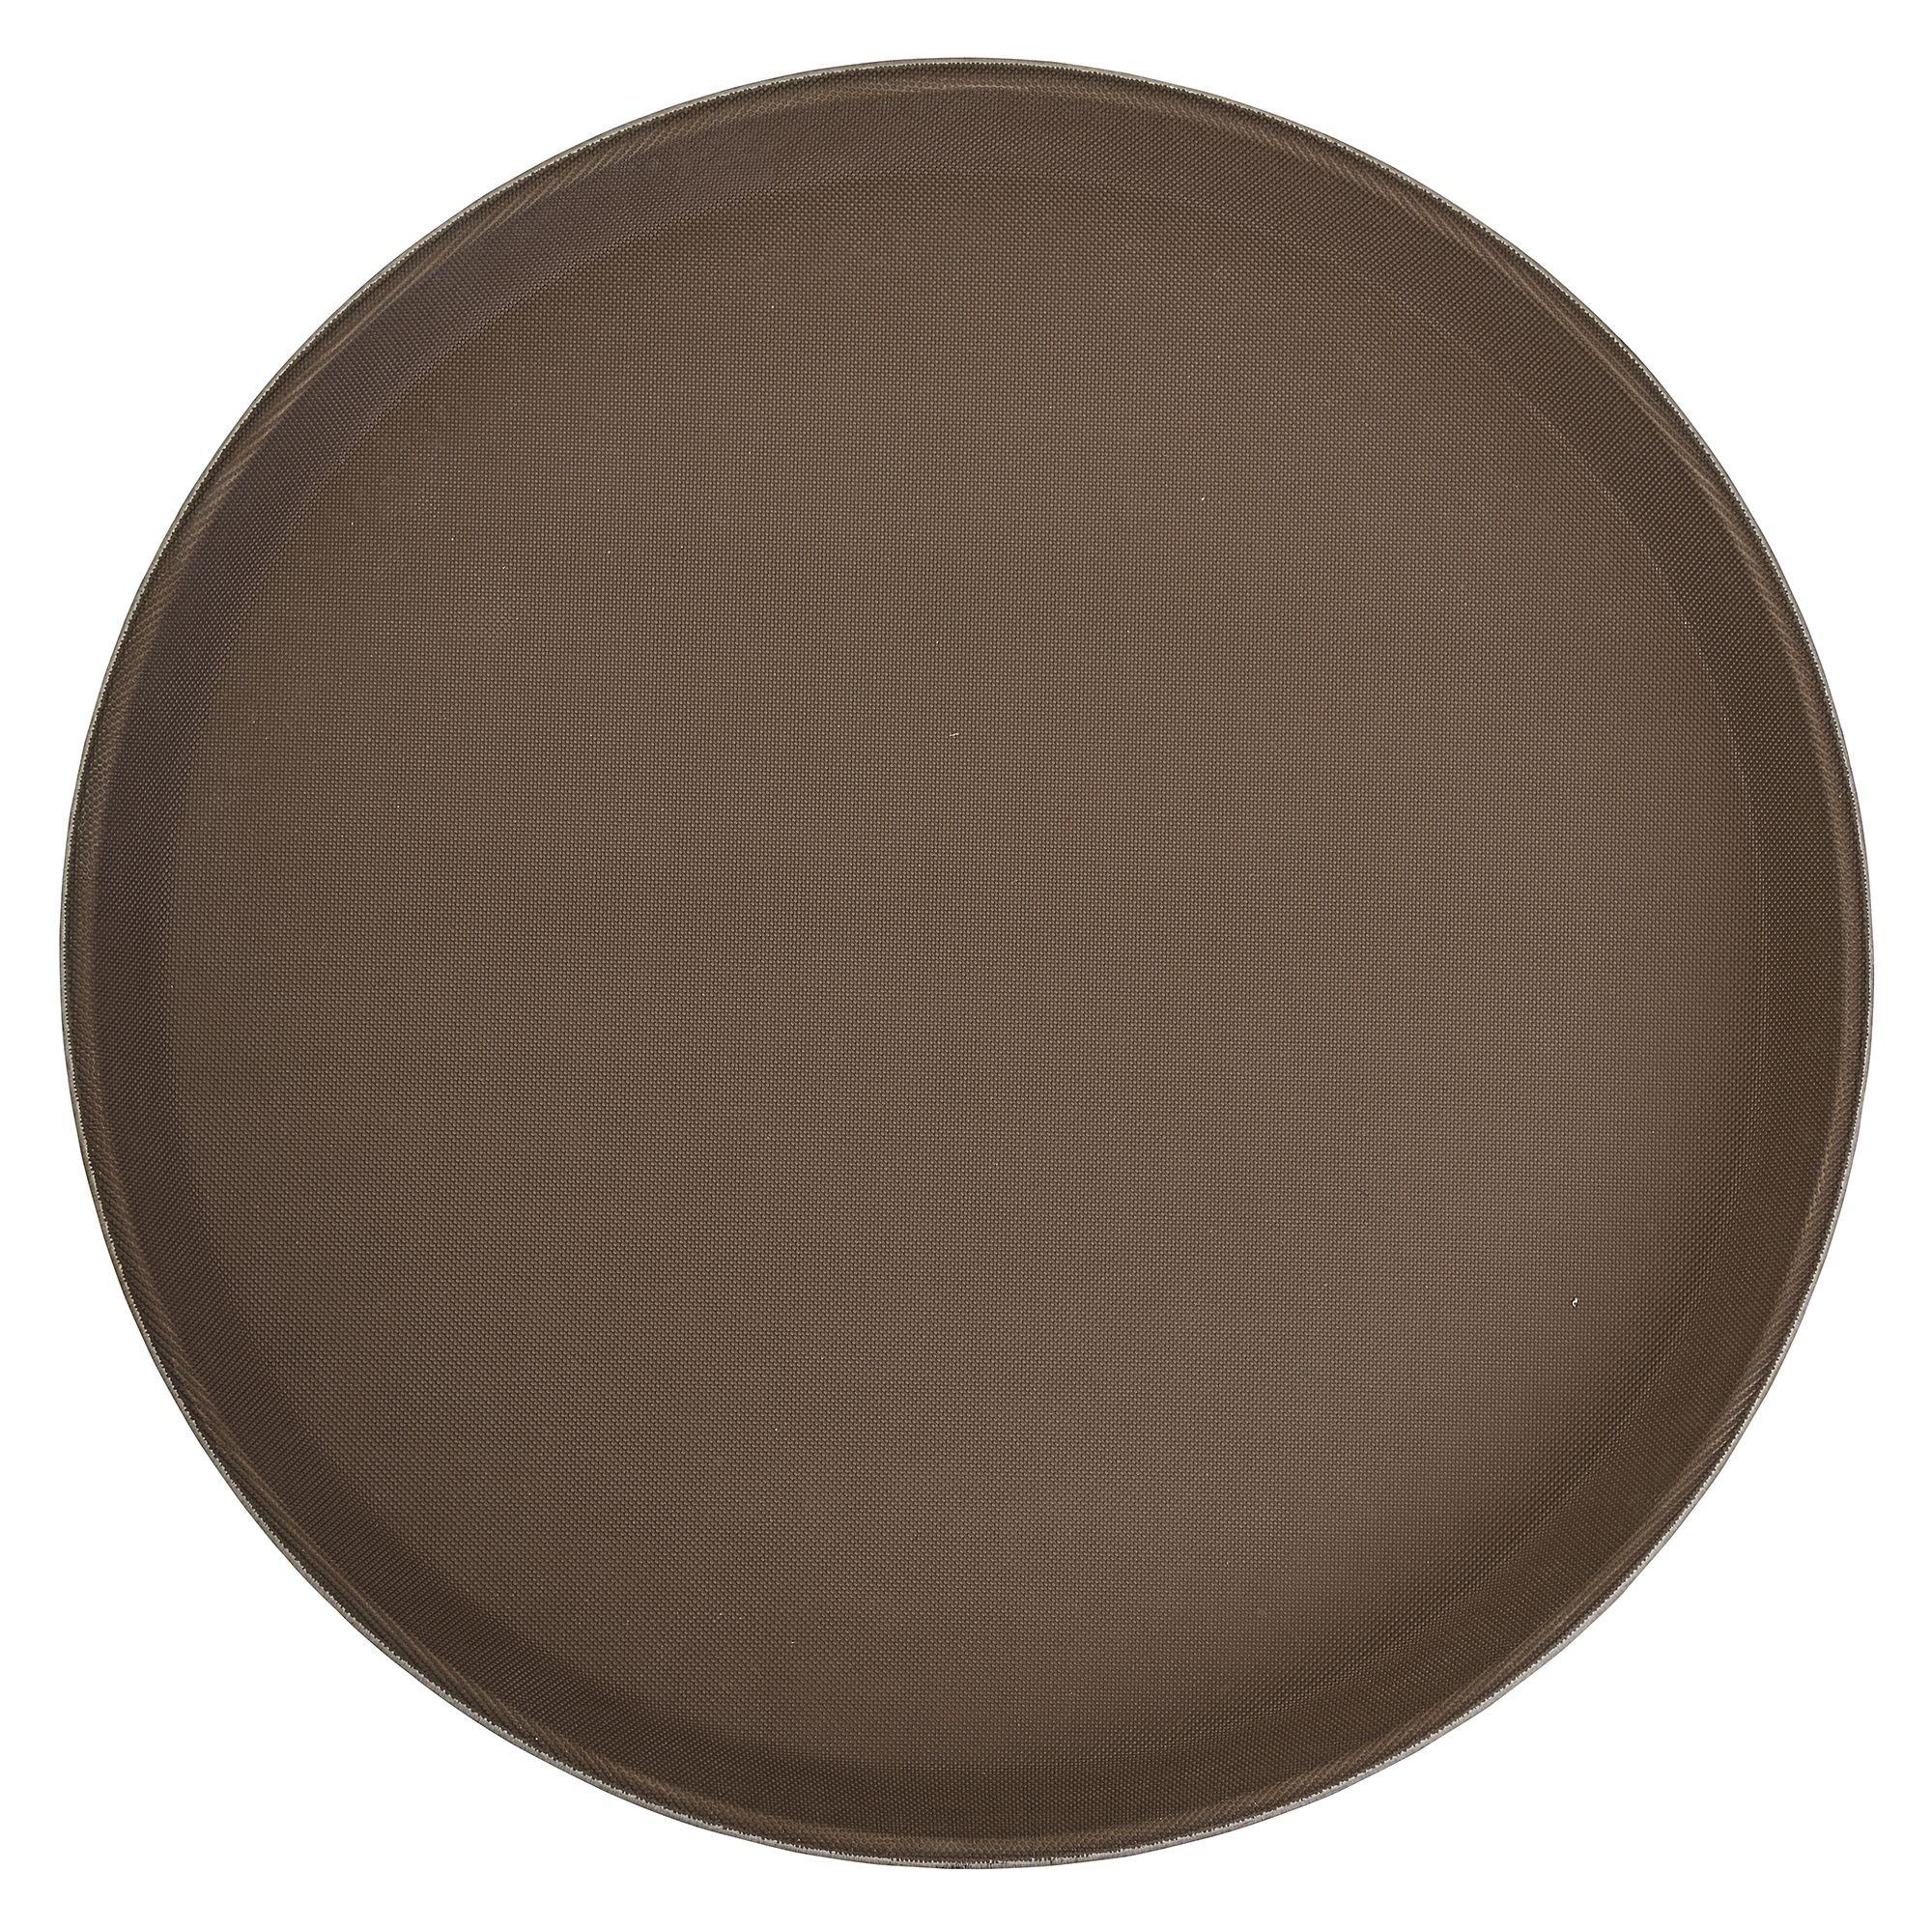 "Winco TFG-11N Brown, Round Non-Slip Fiberglass Tray, 11"""